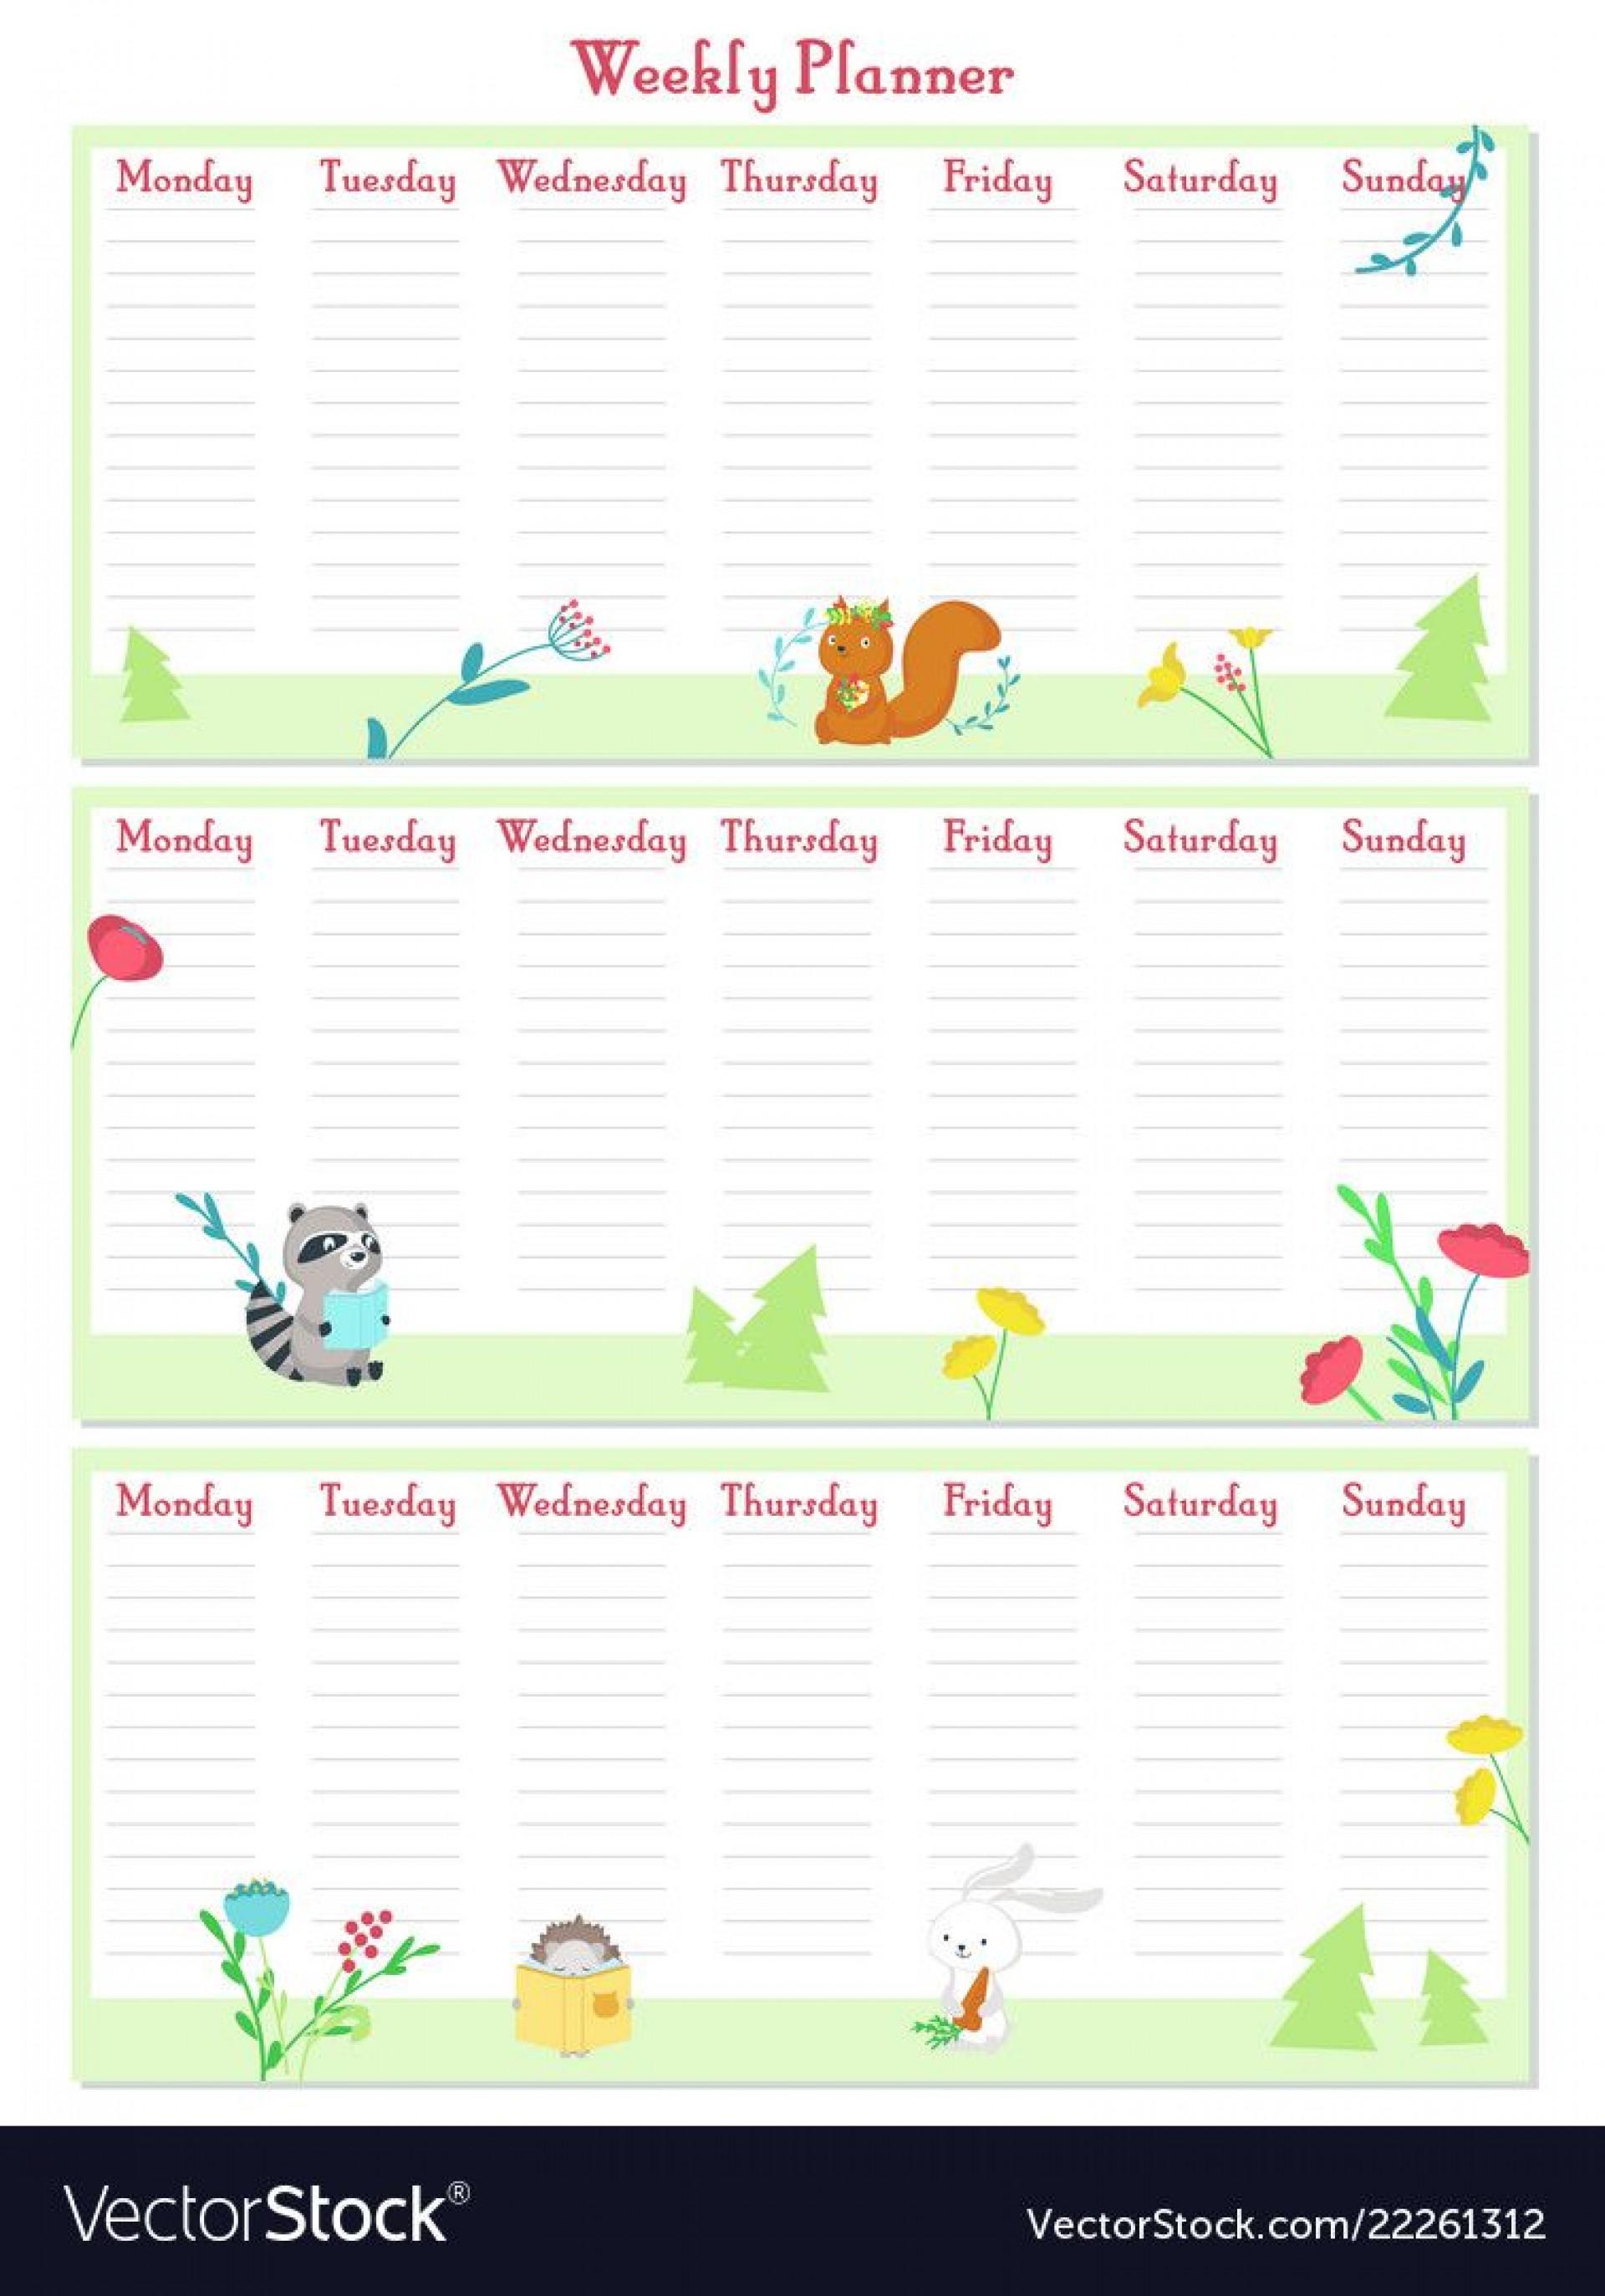 009 Incredible Printable Weekly Planner Template Cute Highest Clarity  Free Calendar1920